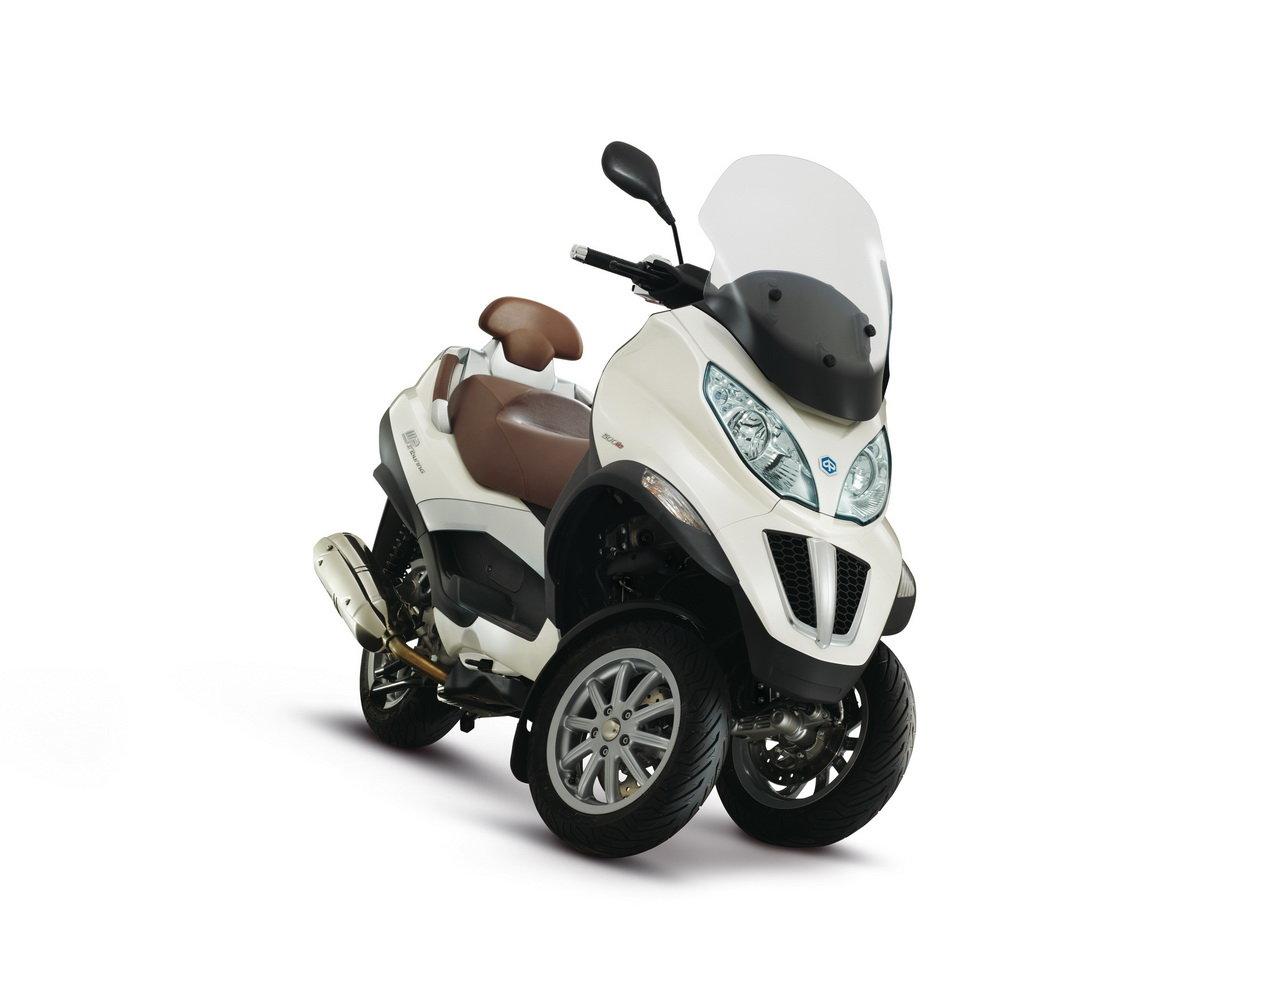 Listino Piaggio Liberty 50 2T Teens Scooter 50 - image 15117_piaggio-mp3500-ie-business-lt on http://moto.motori.net